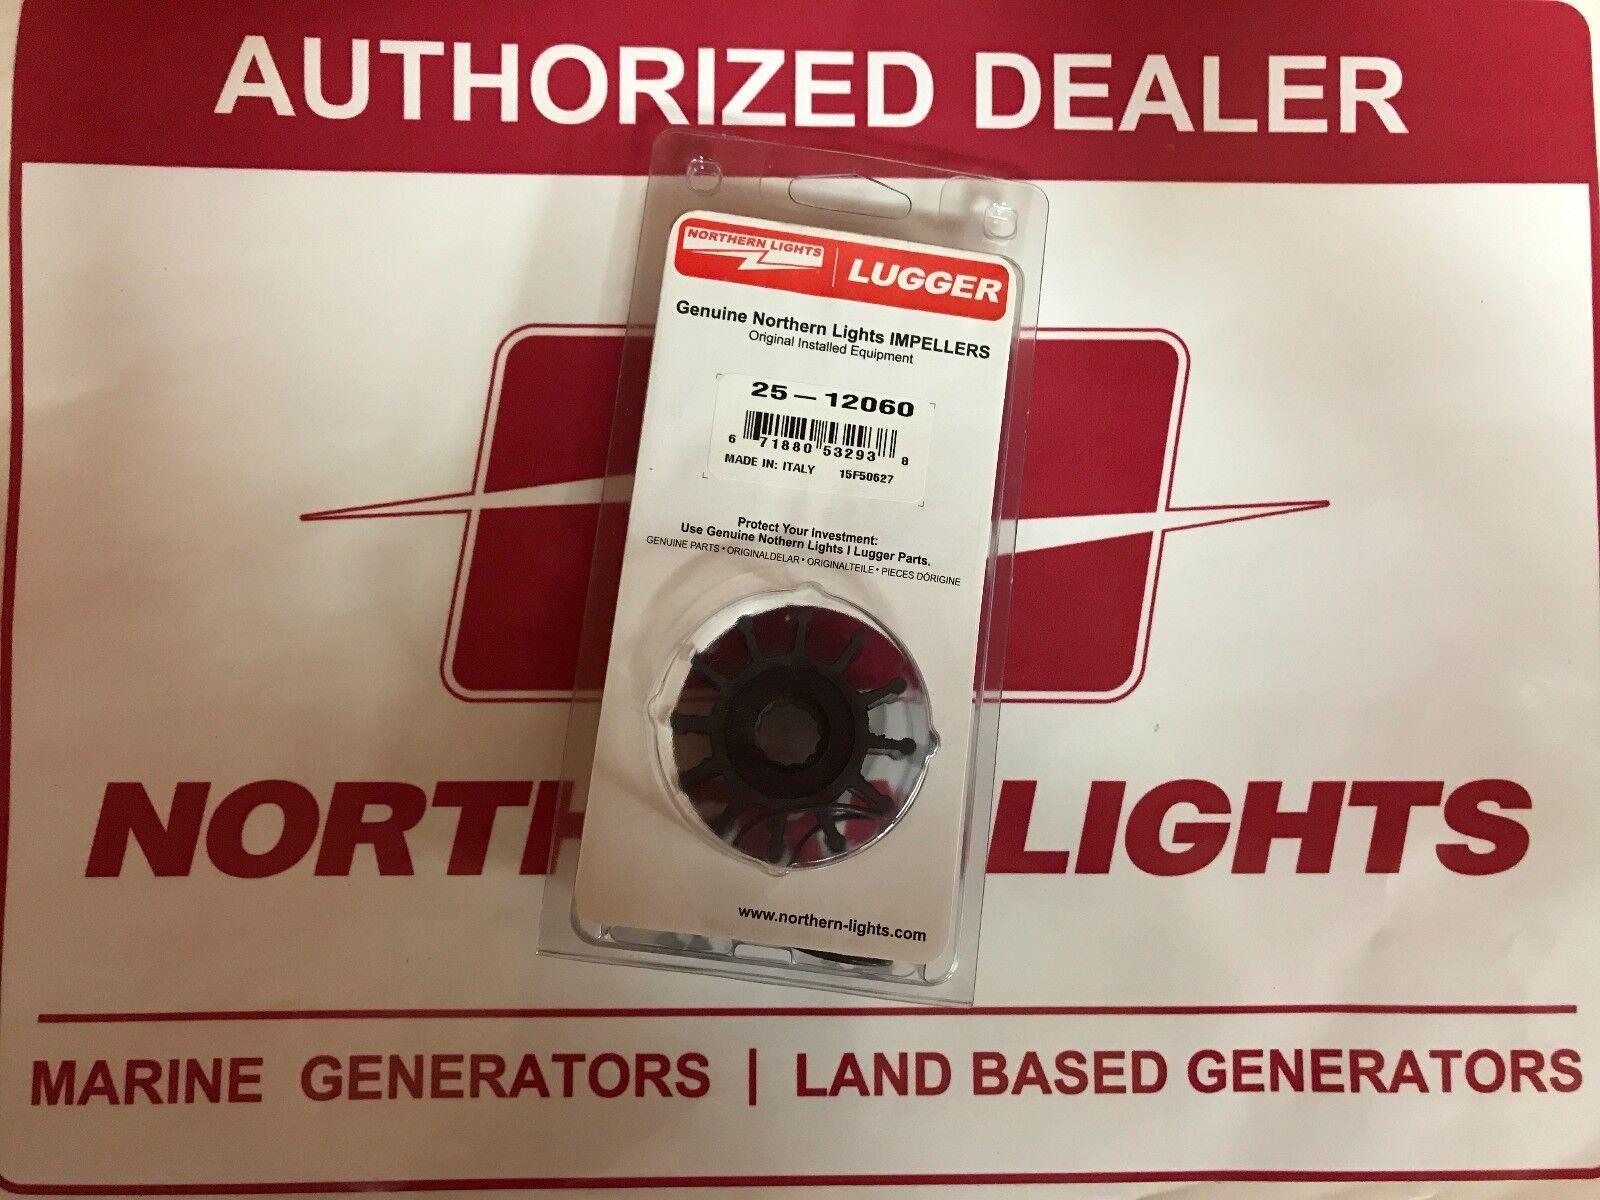 Northern lights 25-1206 Impeller Kit with Gasket & O-Ring 145116140 25-12002